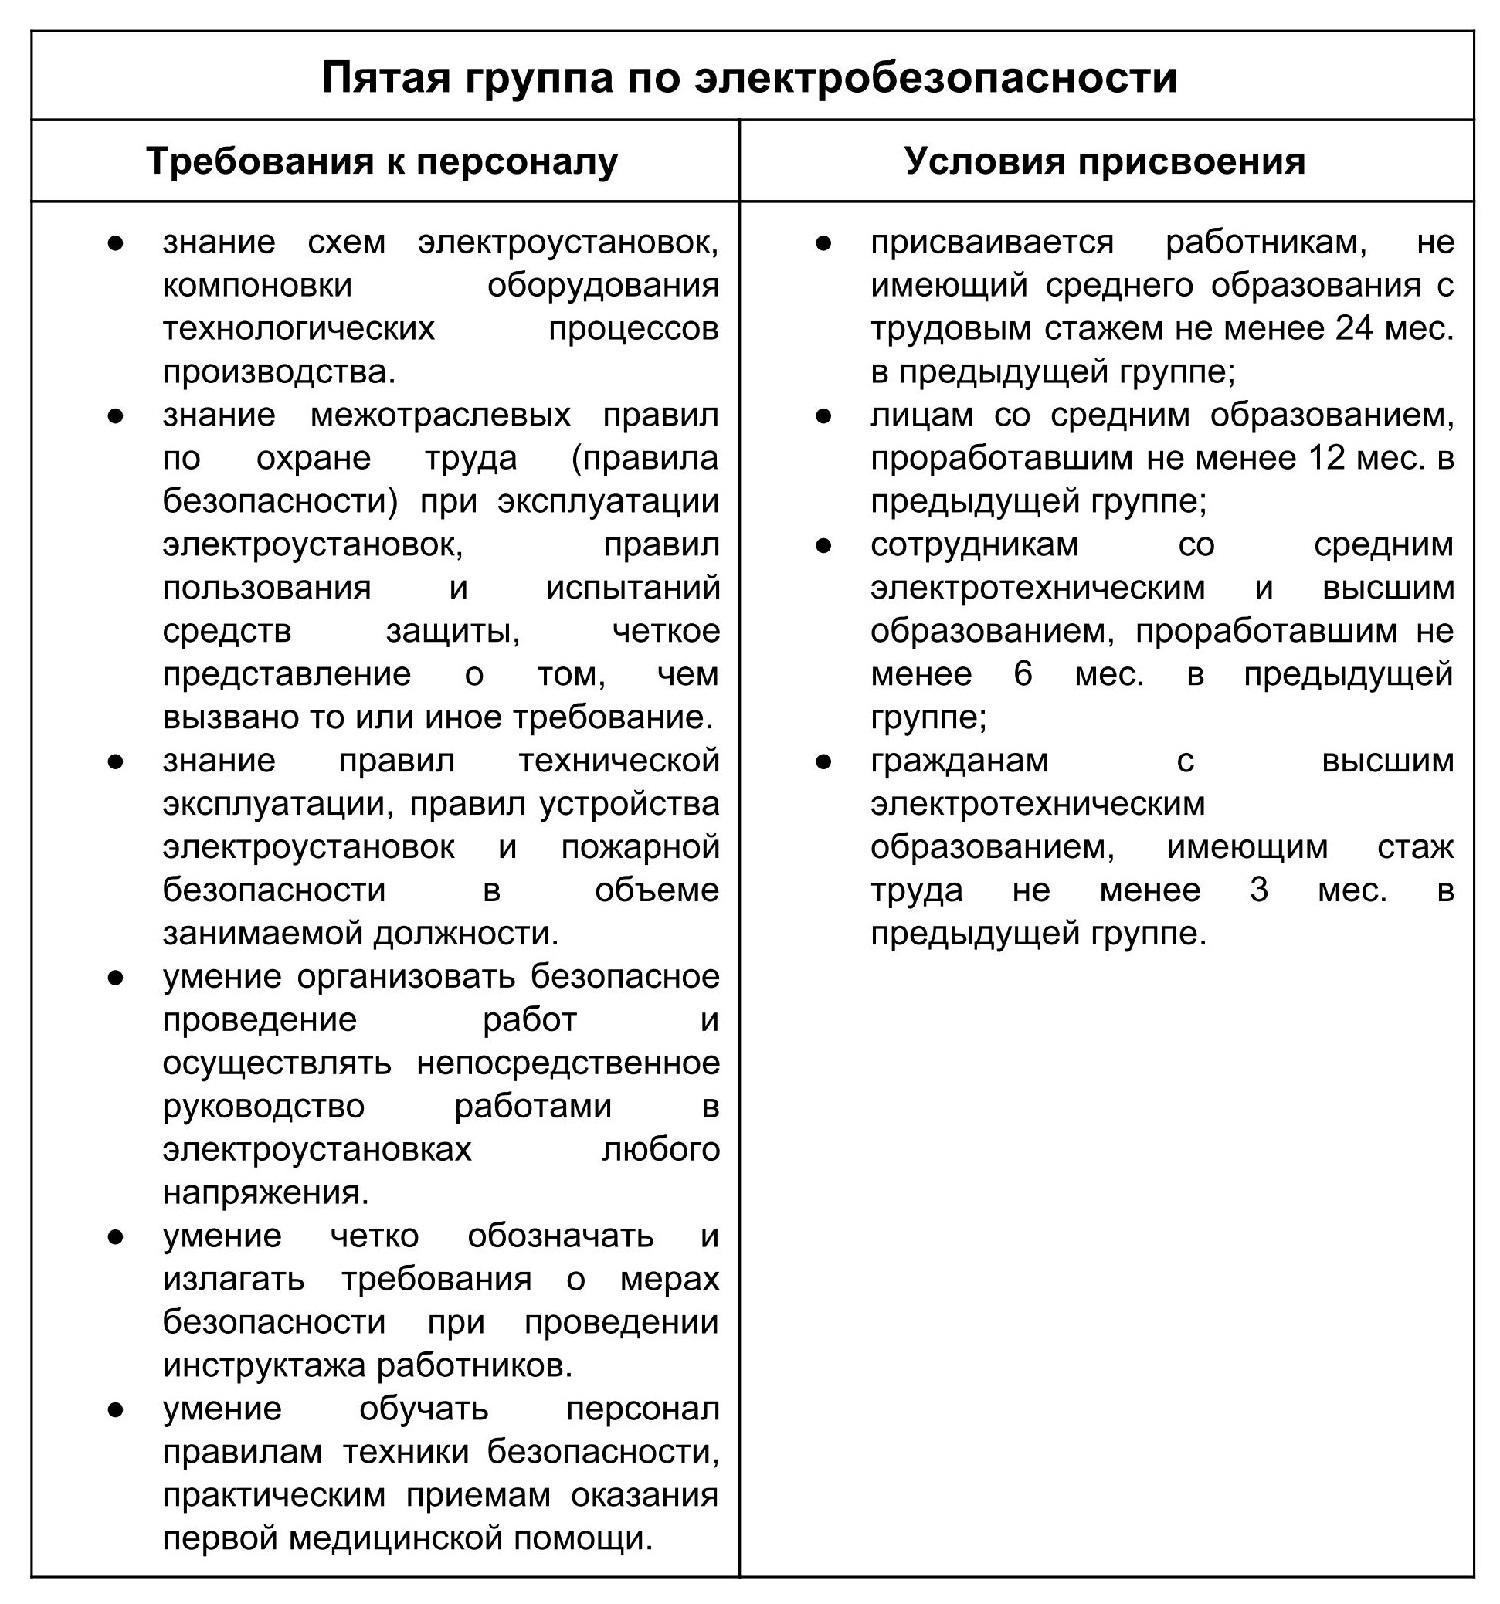 Обязанности по группам электробезопасности председателем комиссии по электробезопасности